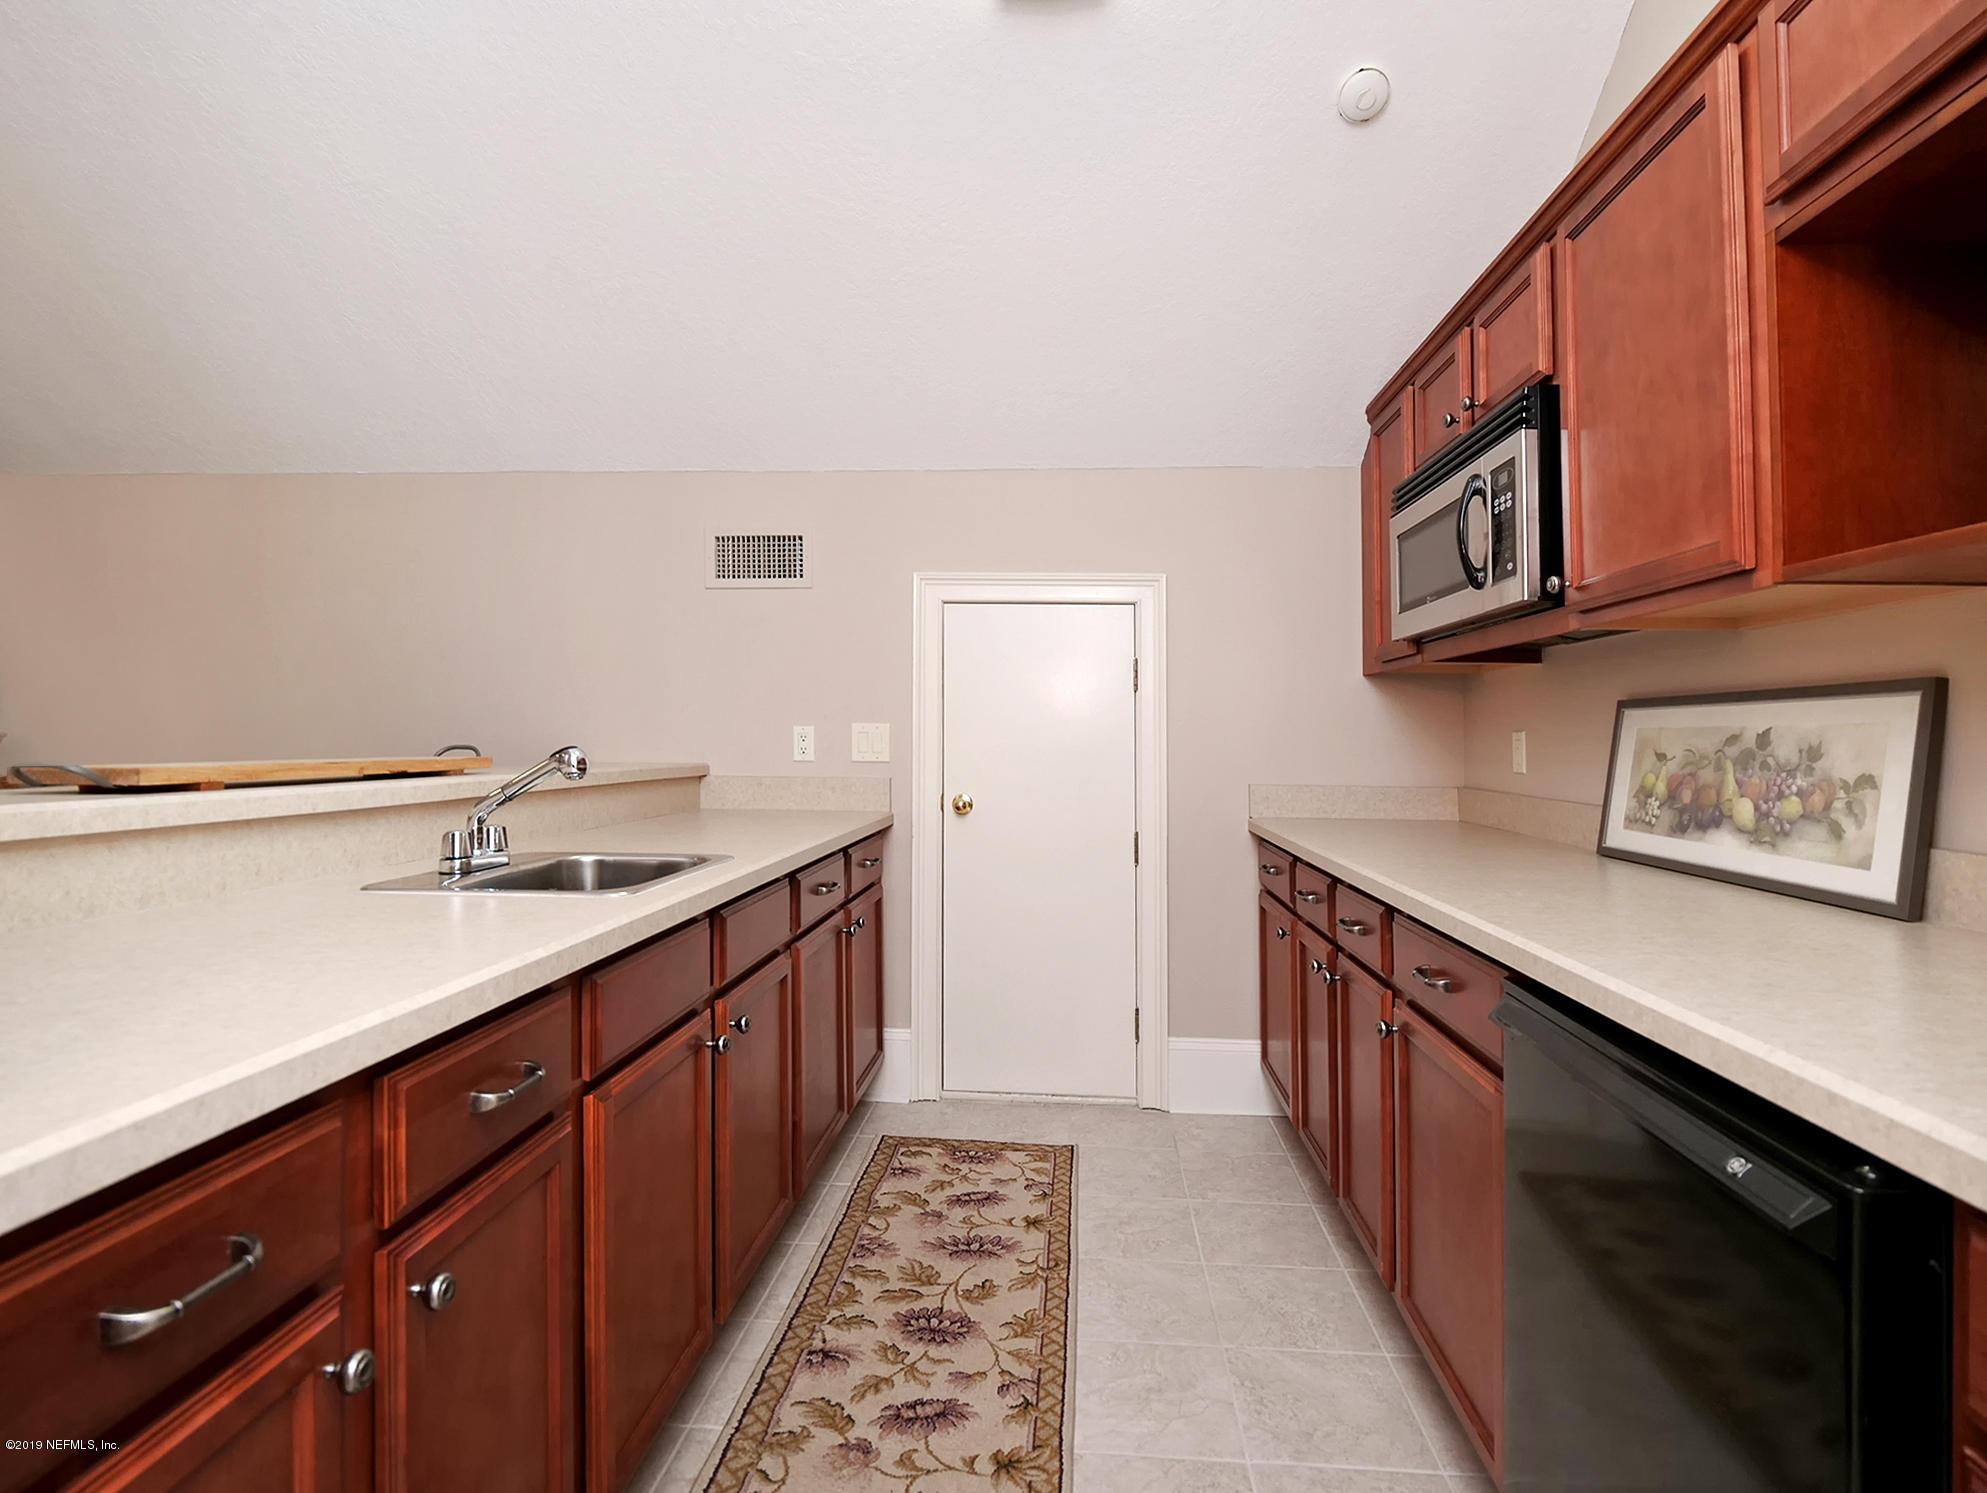 104 HERITAGE, PONTE VEDRA BEACH, FLORIDA 32082, 5 Bedrooms Bedrooms, ,6 BathroomsBathrooms,Residential - single family,For sale,HERITAGE,990697